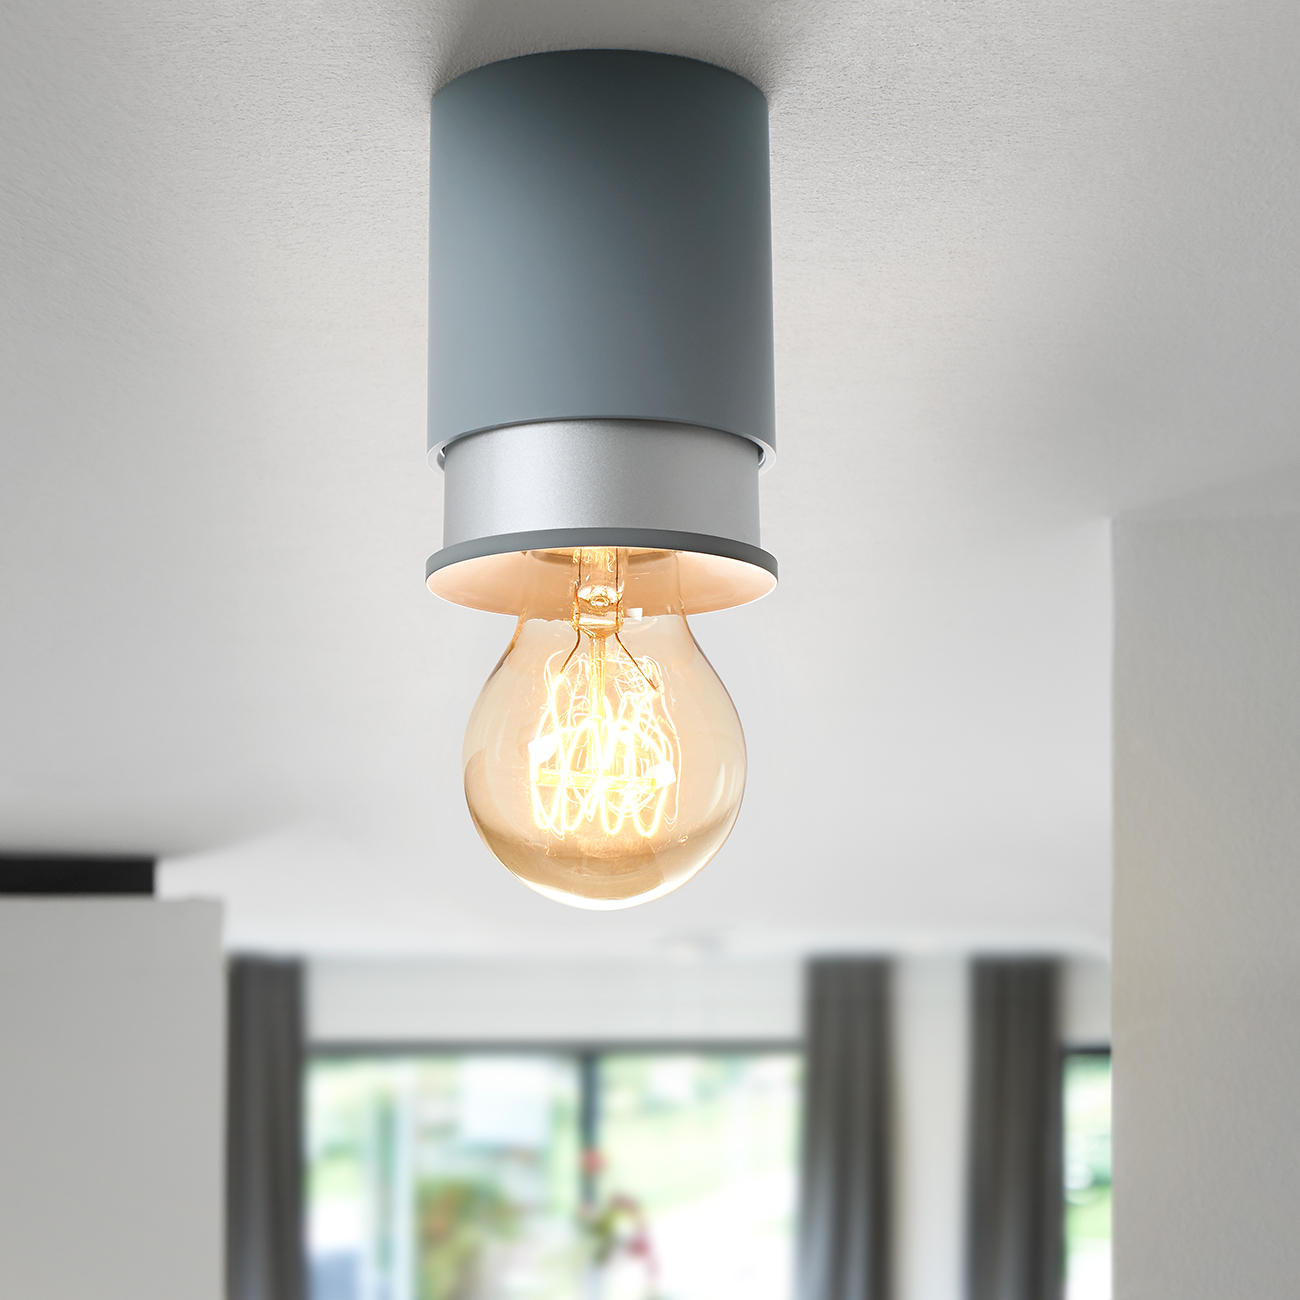 twister lighting 3 jaar productgarantie pro idee. Black Bedroom Furniture Sets. Home Design Ideas